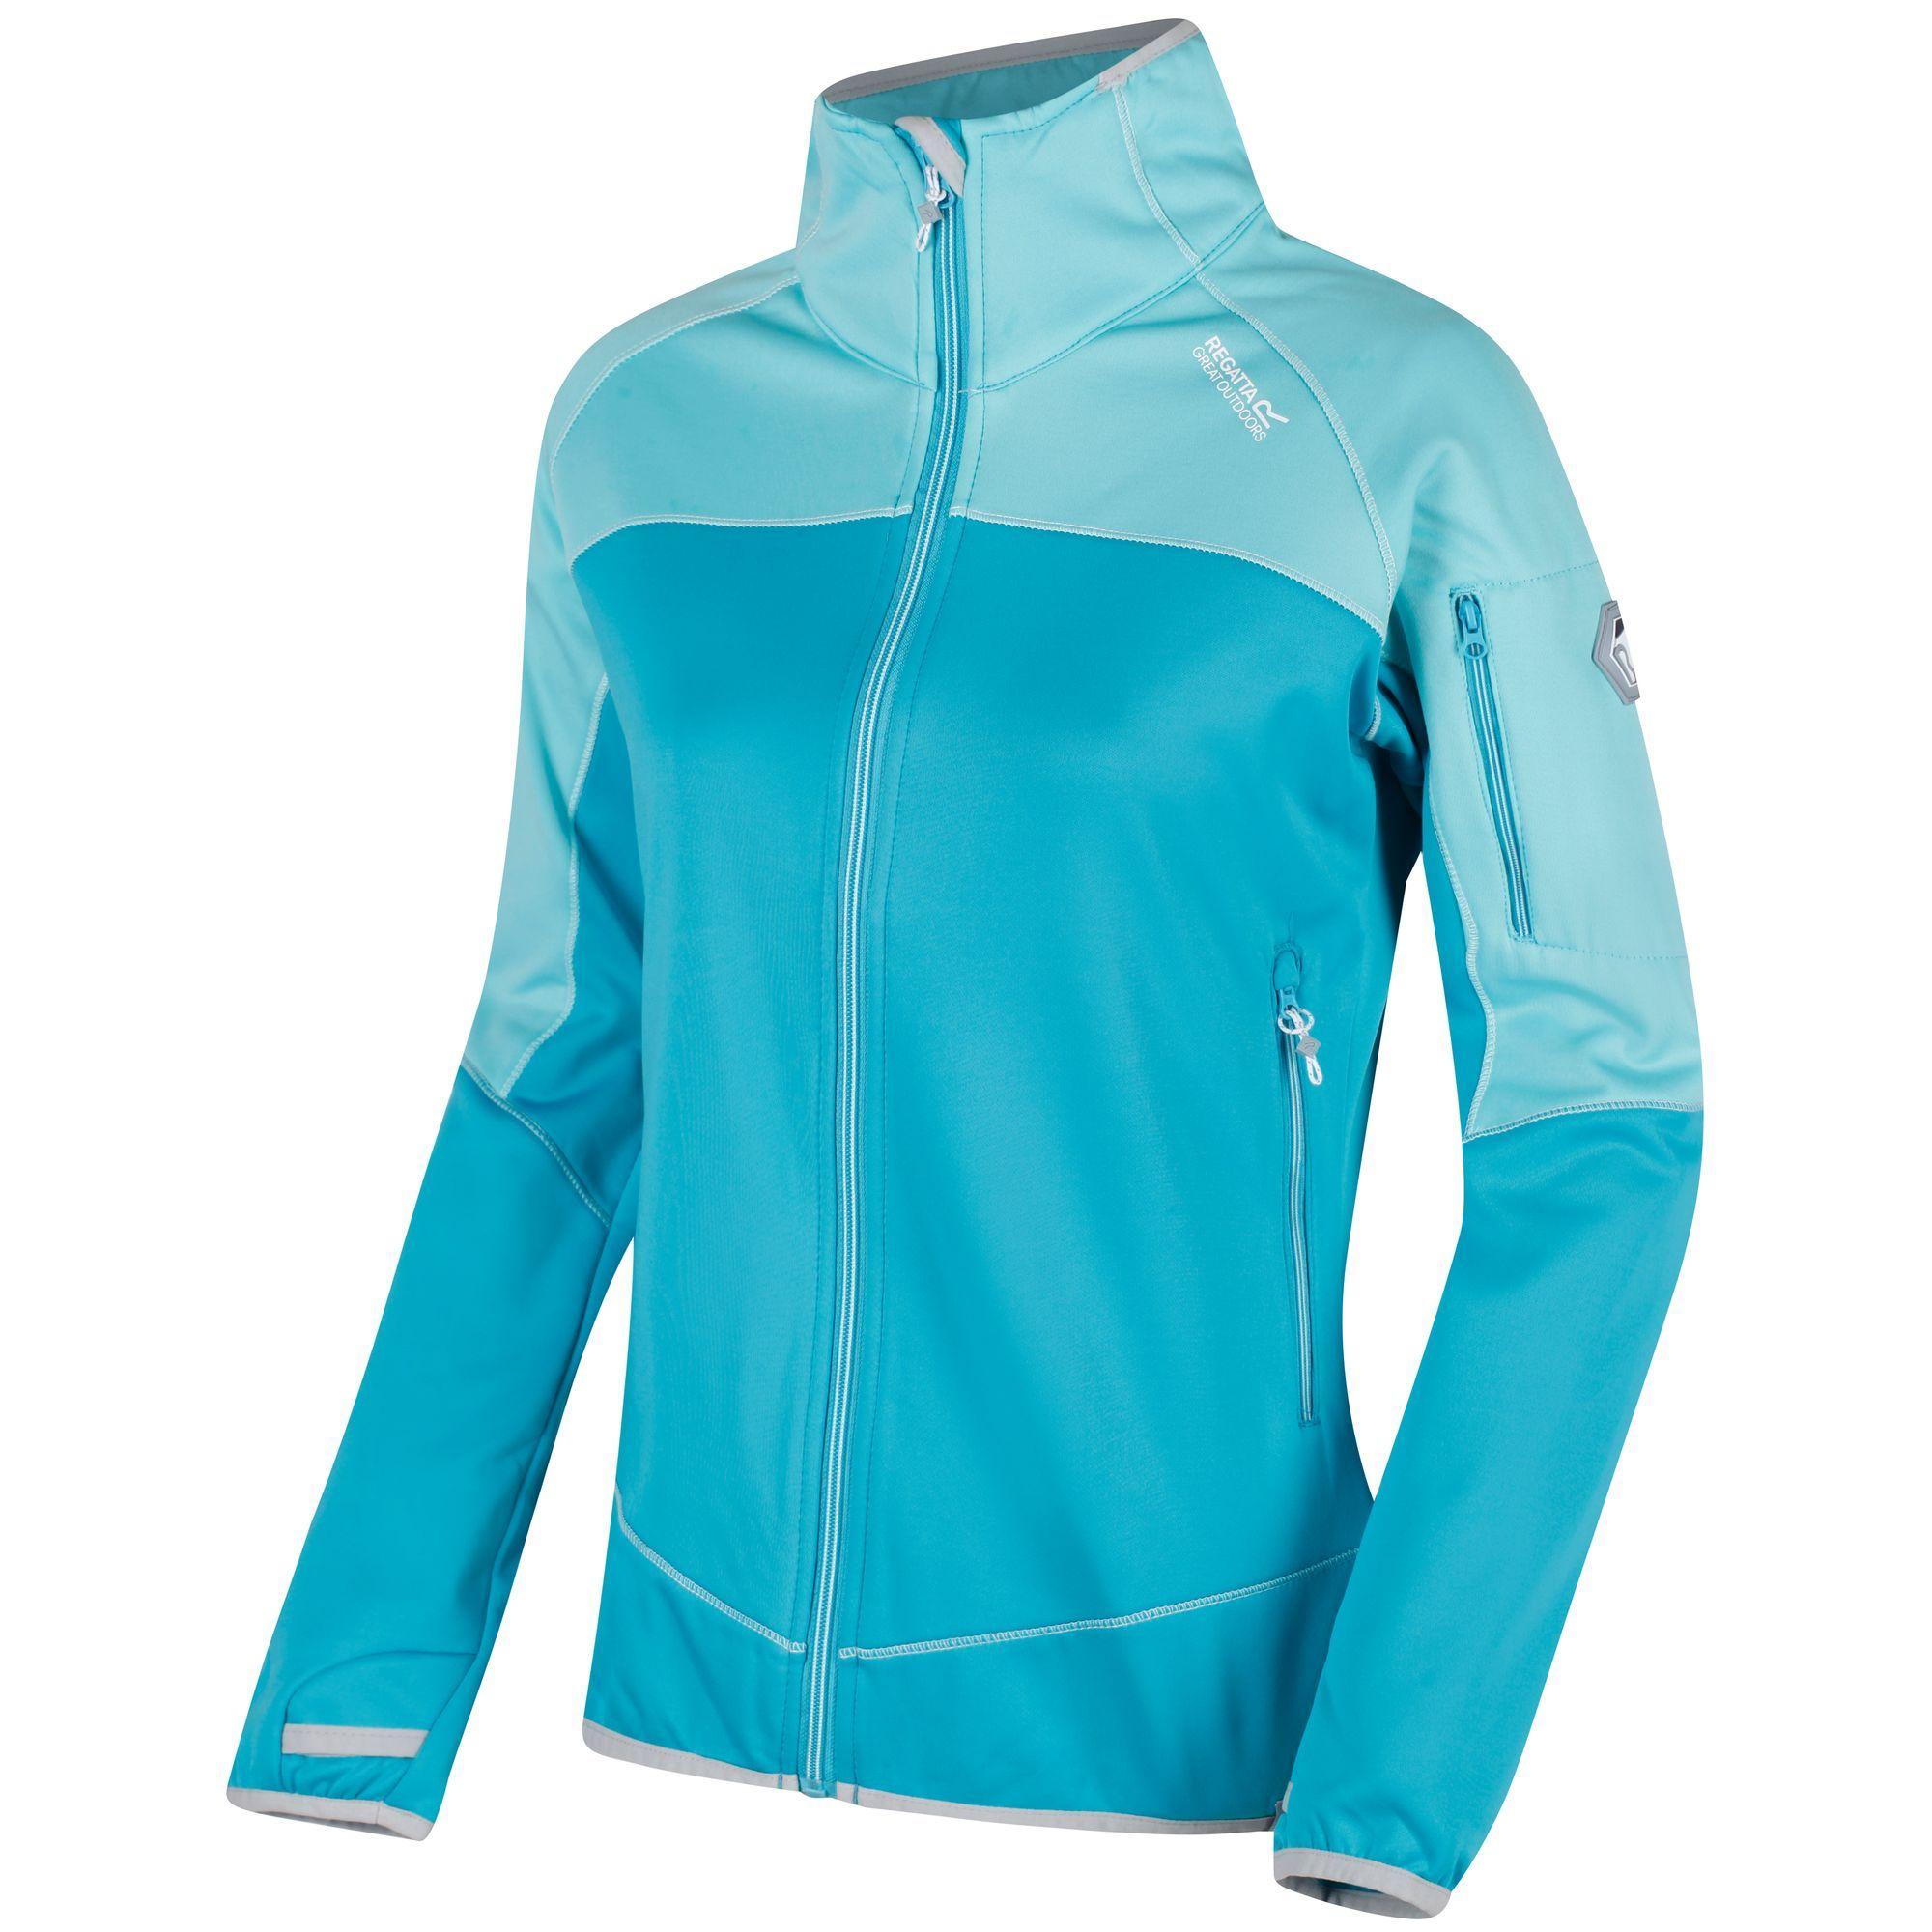 Regatta Great Outdoors Womens/Ladies Laney III Fleece Jacket (Aqua/Horizon)